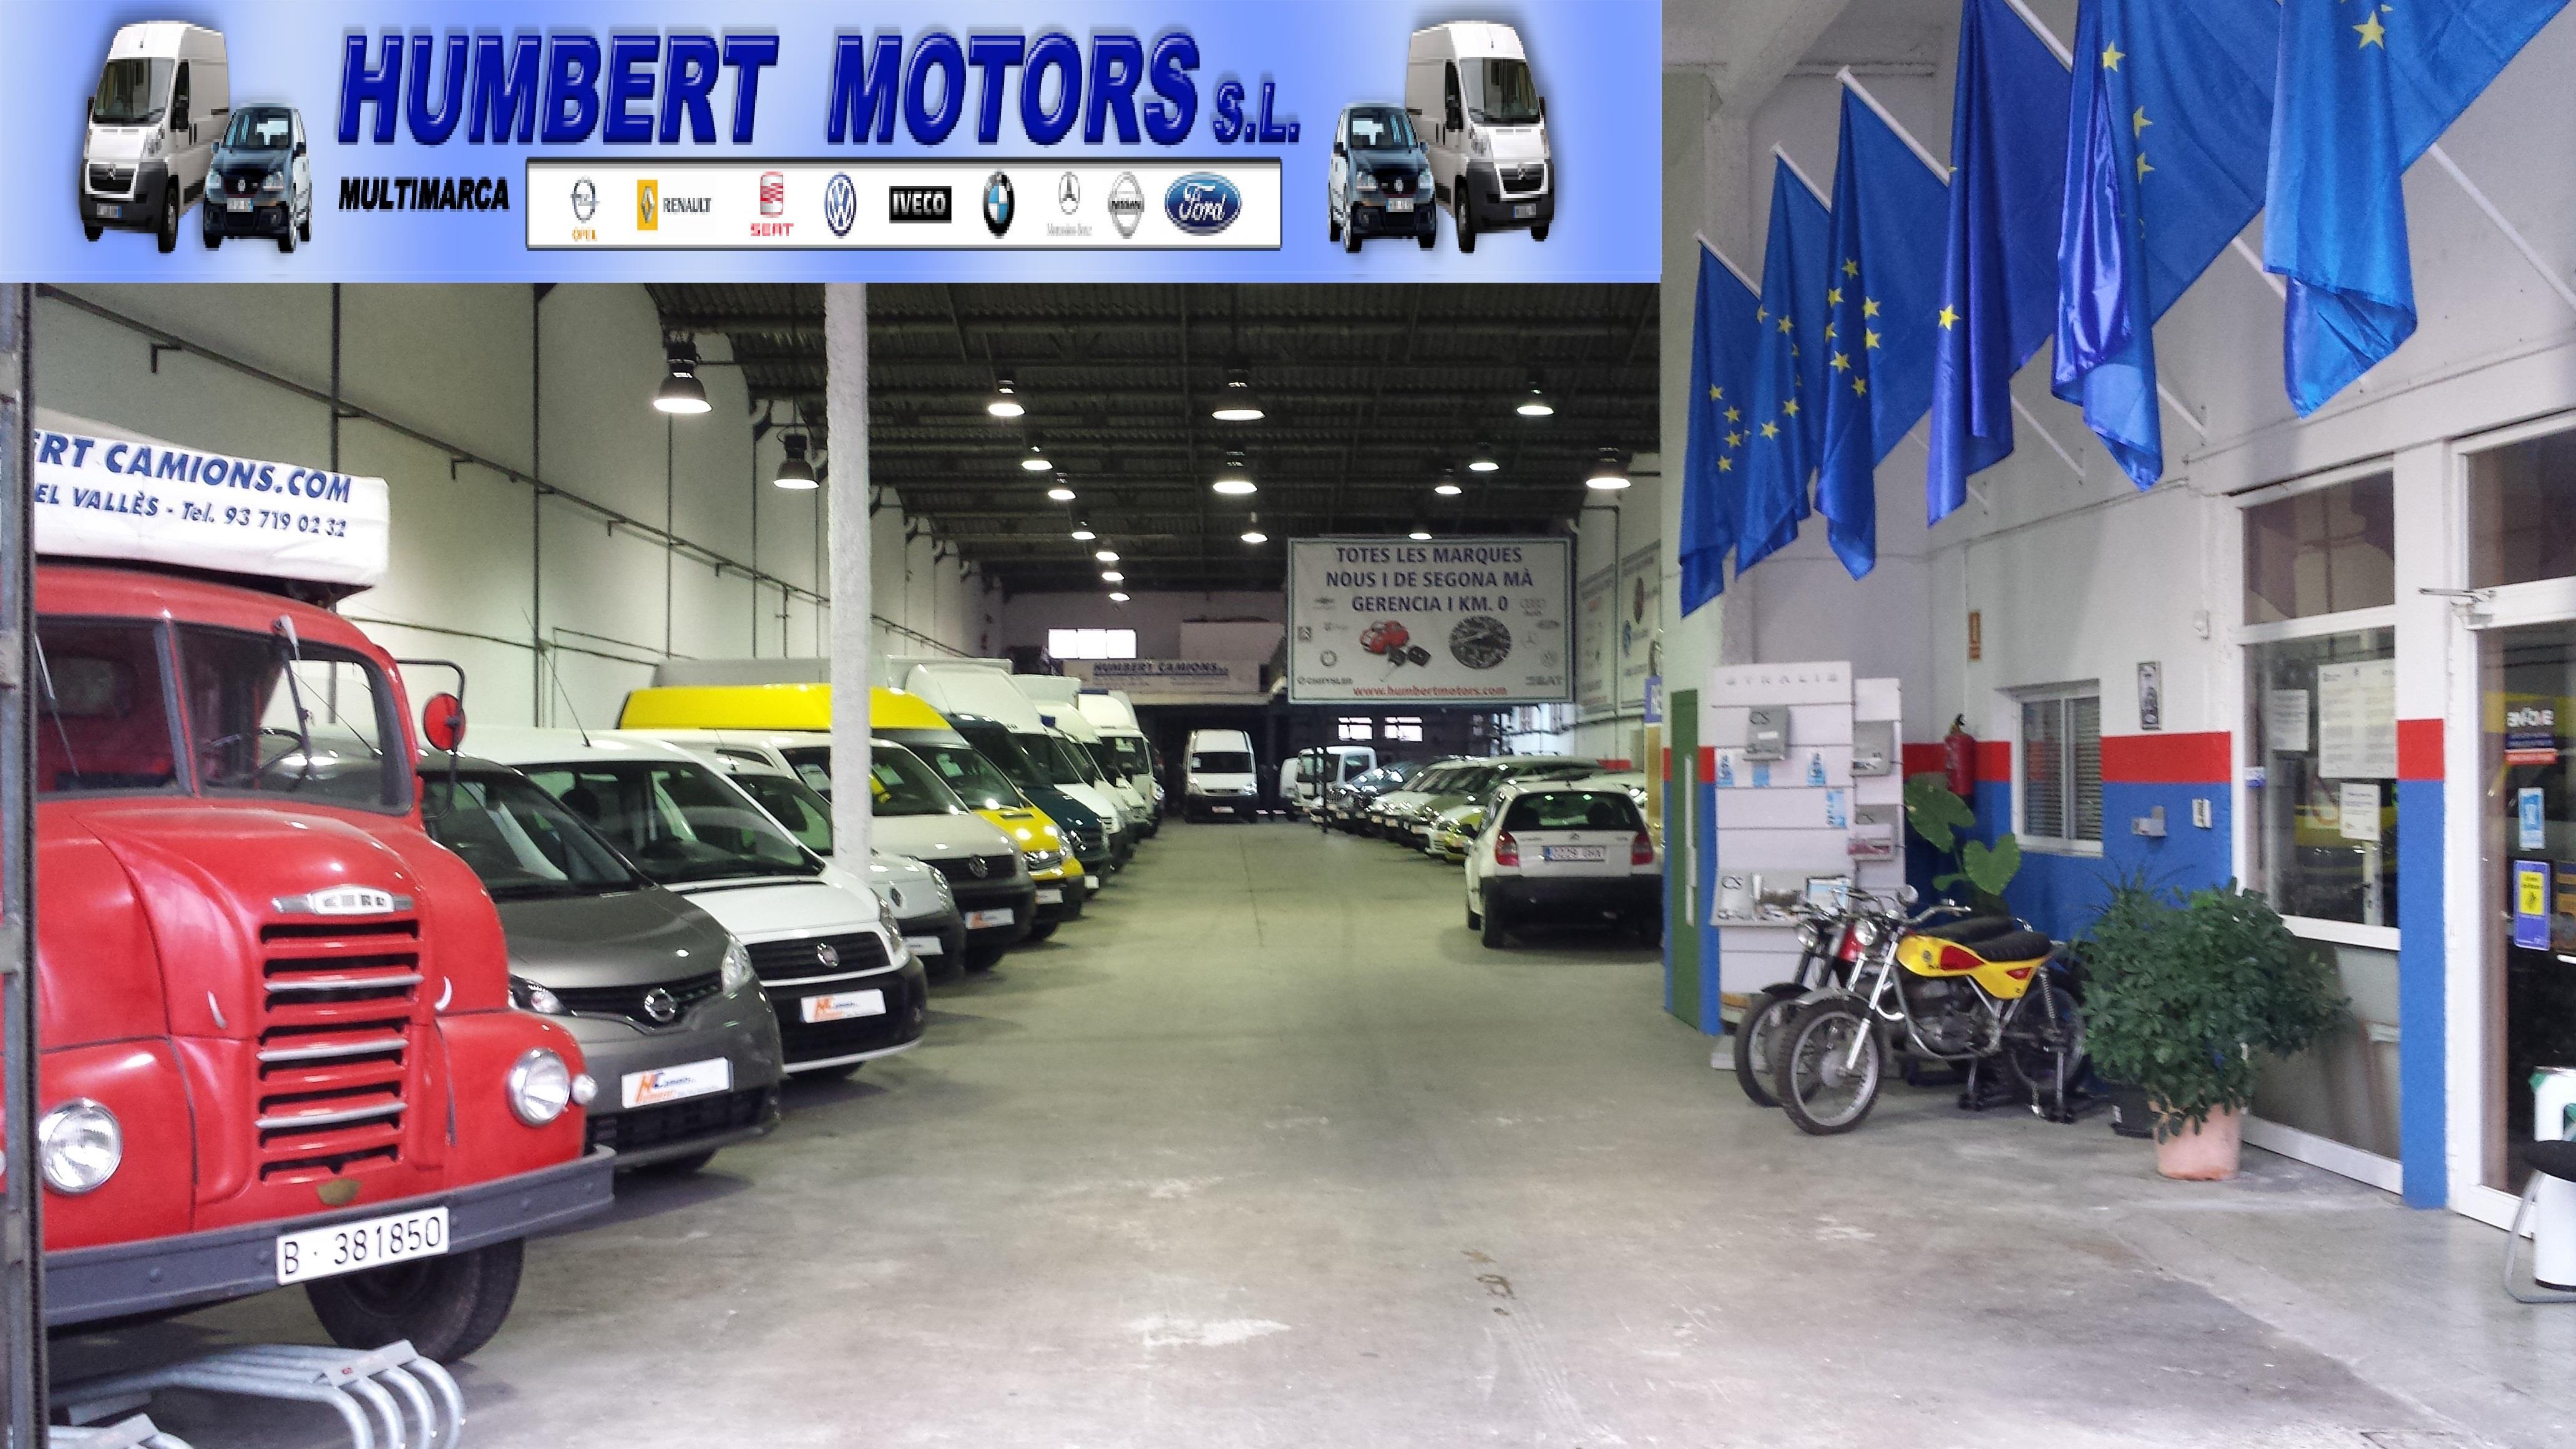 Humbert motors empresas de camiones y veh culos - Alquiler furgonetas barbera del valles ...